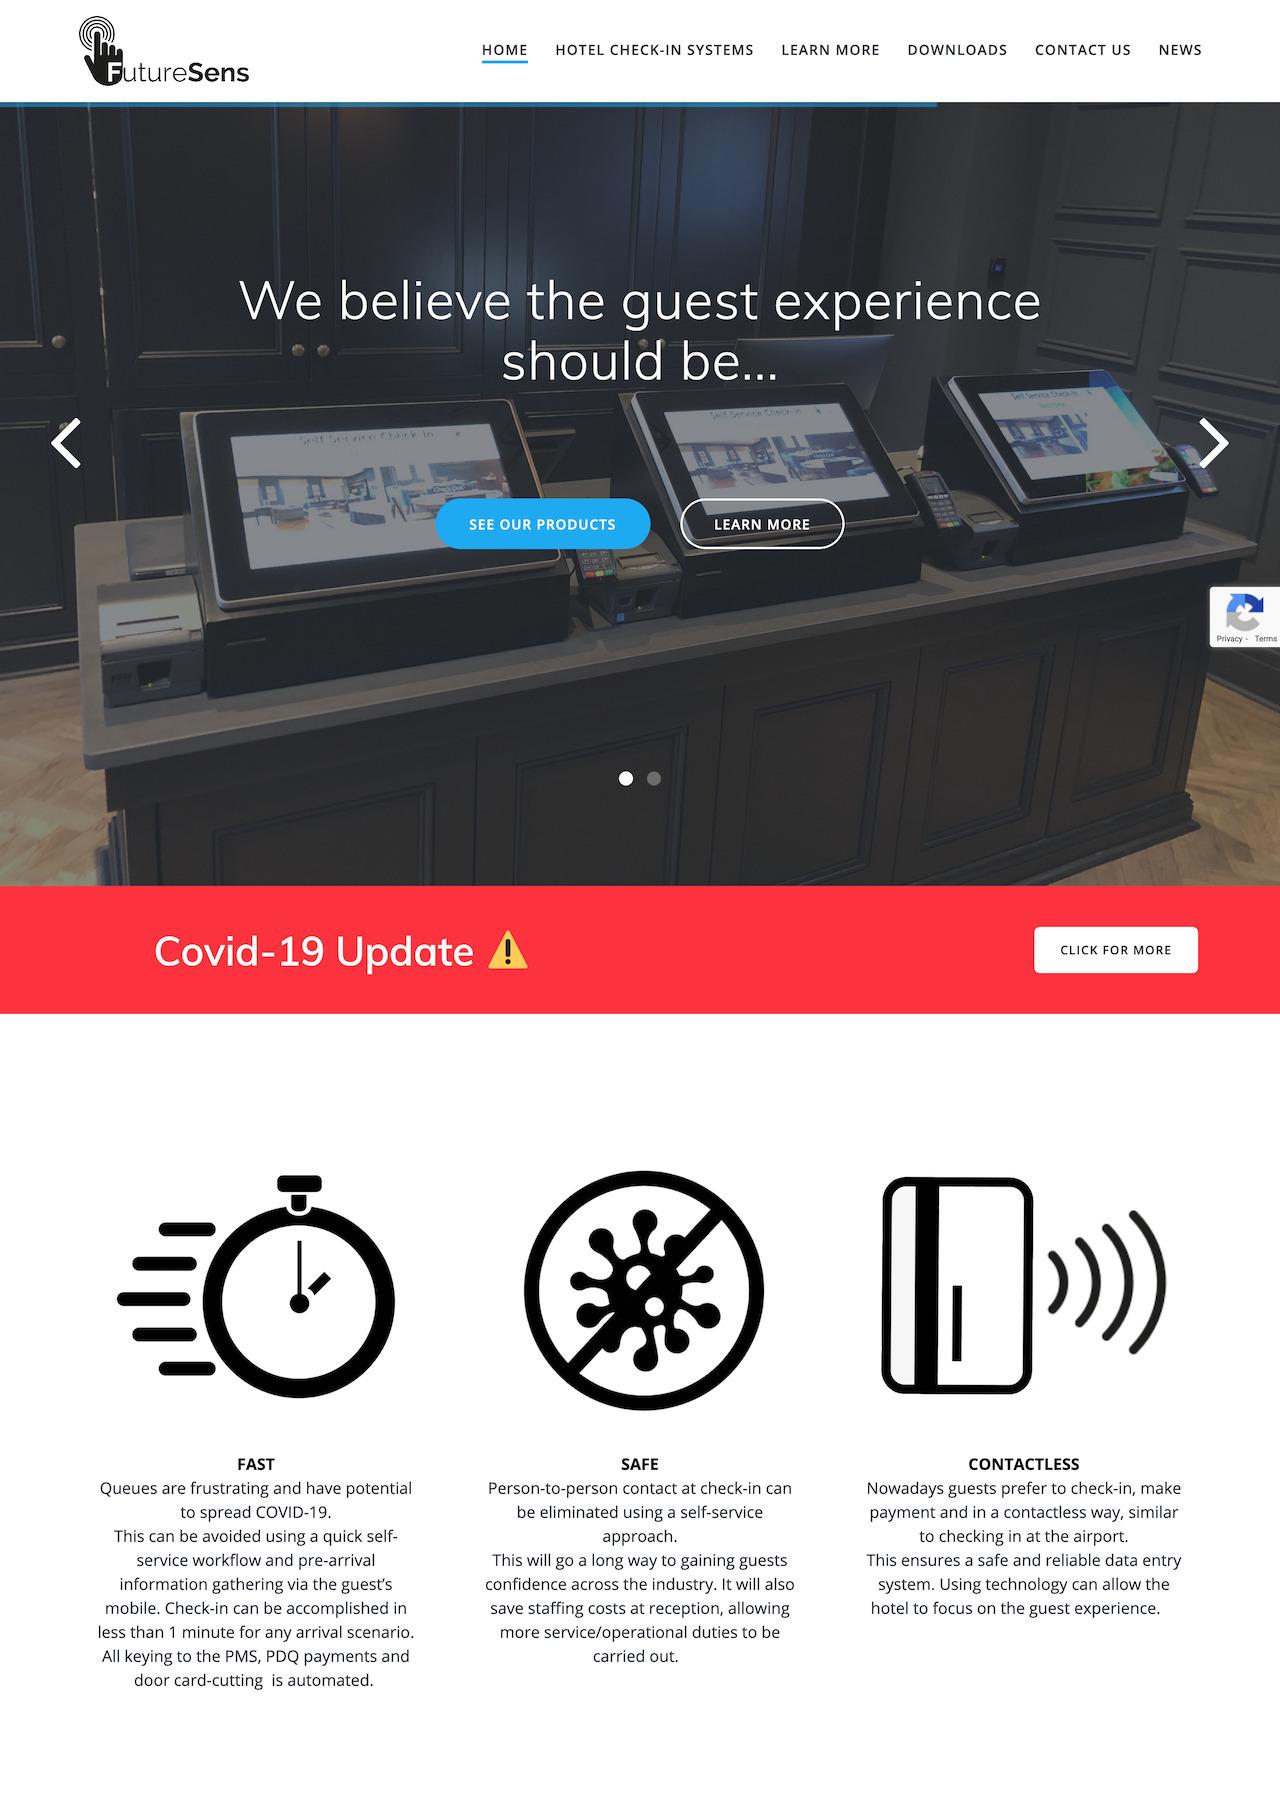 futuresenswebsite